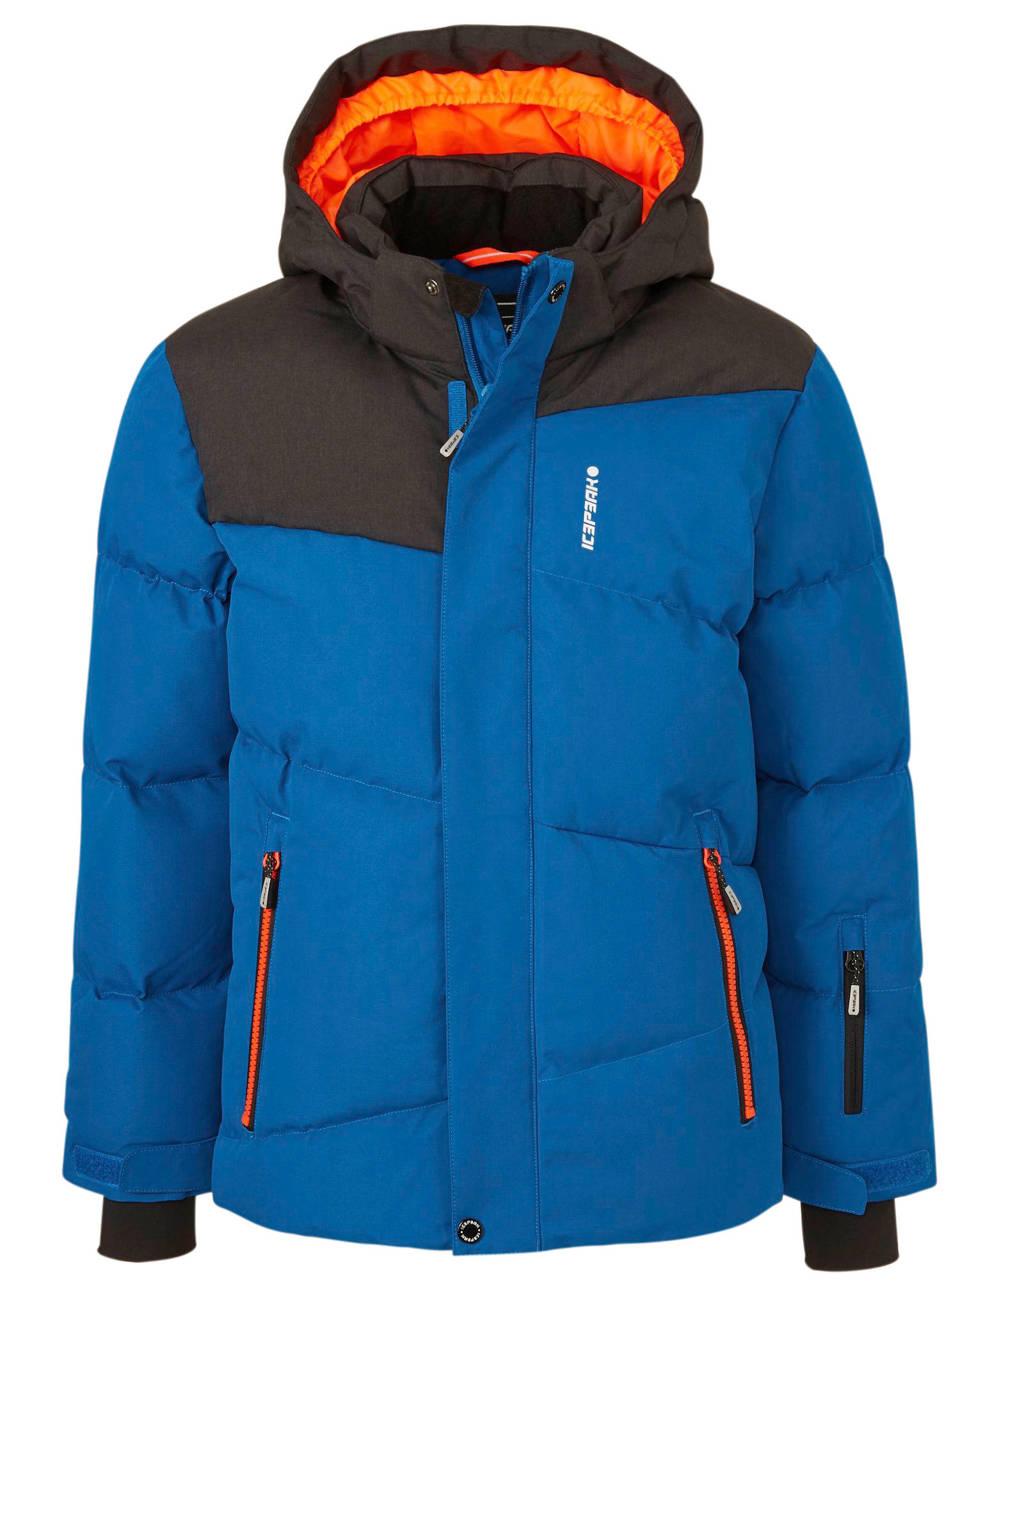 Icepeak ski-jack Linton blauw, Blauw/antraciet/oranje